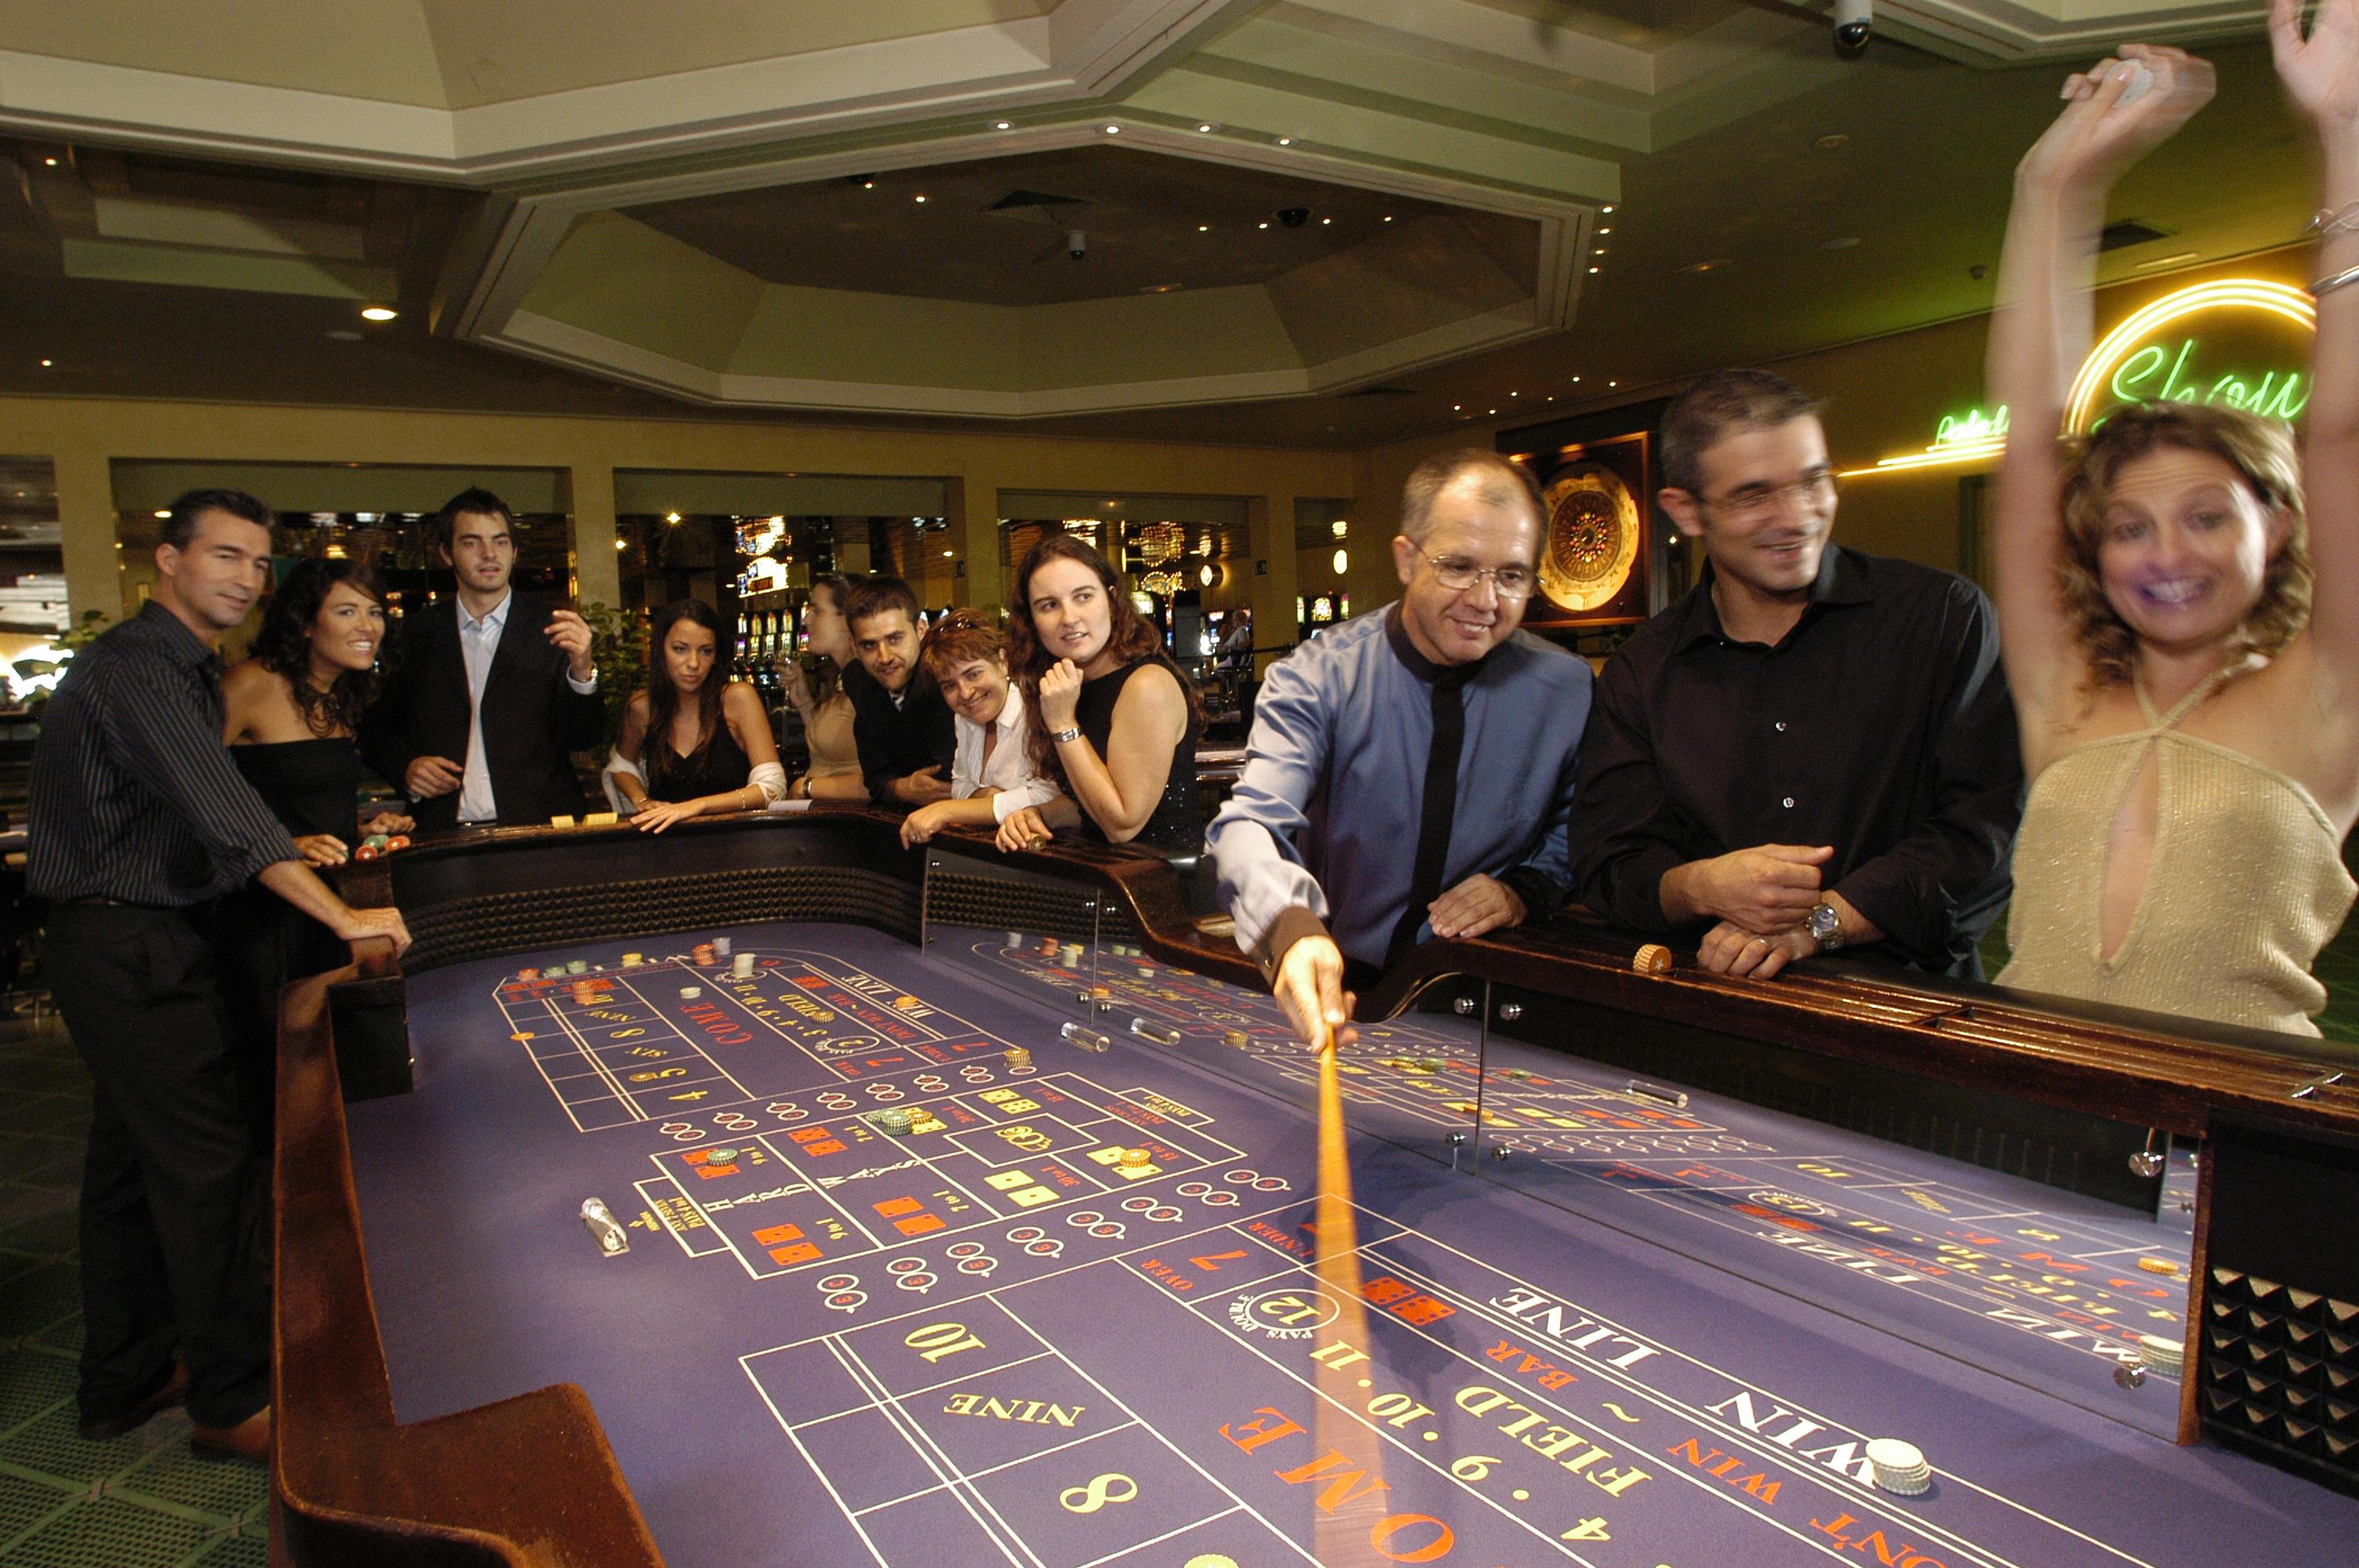 Online casino real money no deposit bonus usa, Metal casino